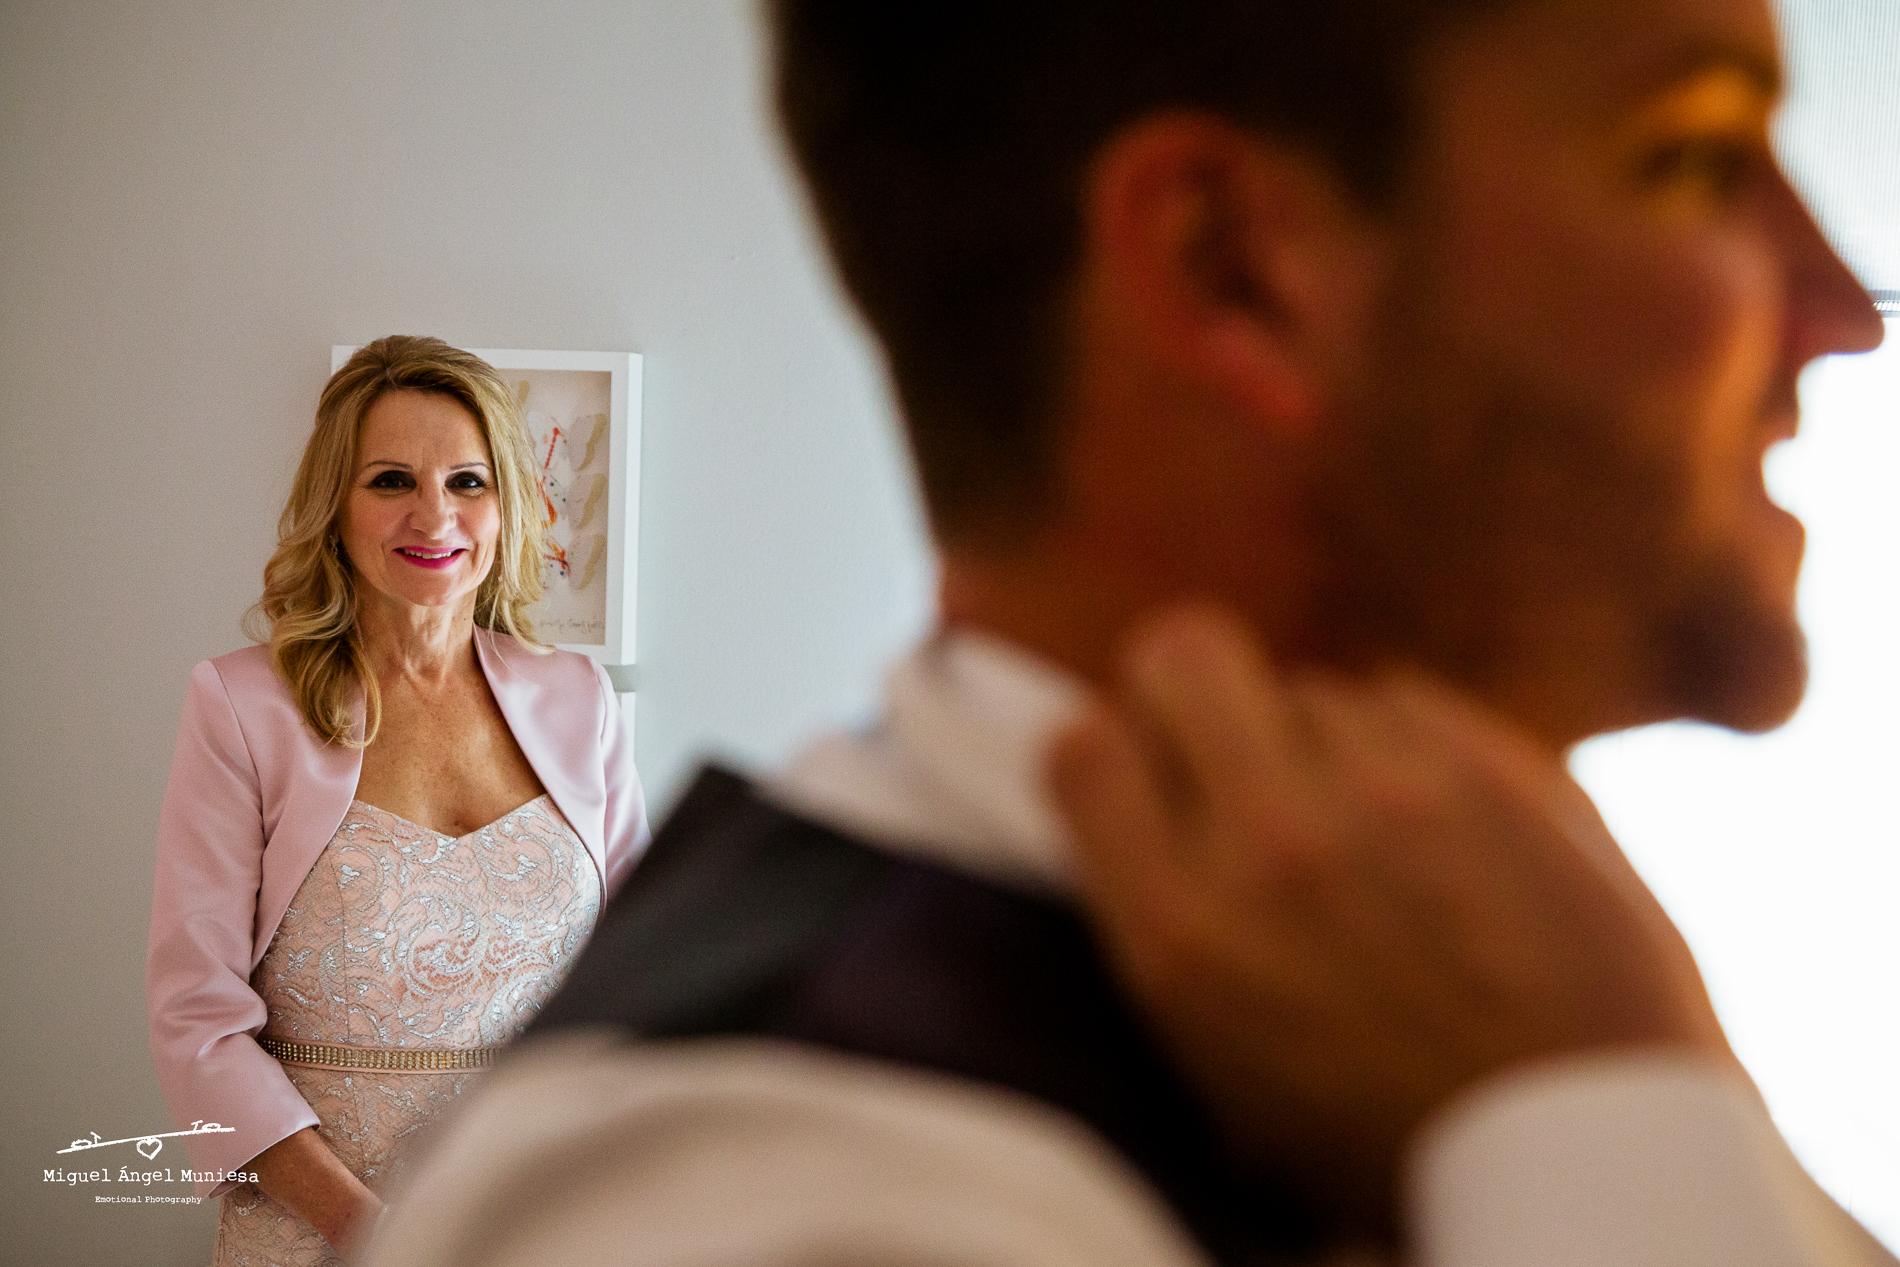 miguel angel muniesa, fotografo boda Teruel, fotografo boda navarra, fotografo boda zaragoza, fotografo boda soria, miguel angel muniesa emotional photography_04